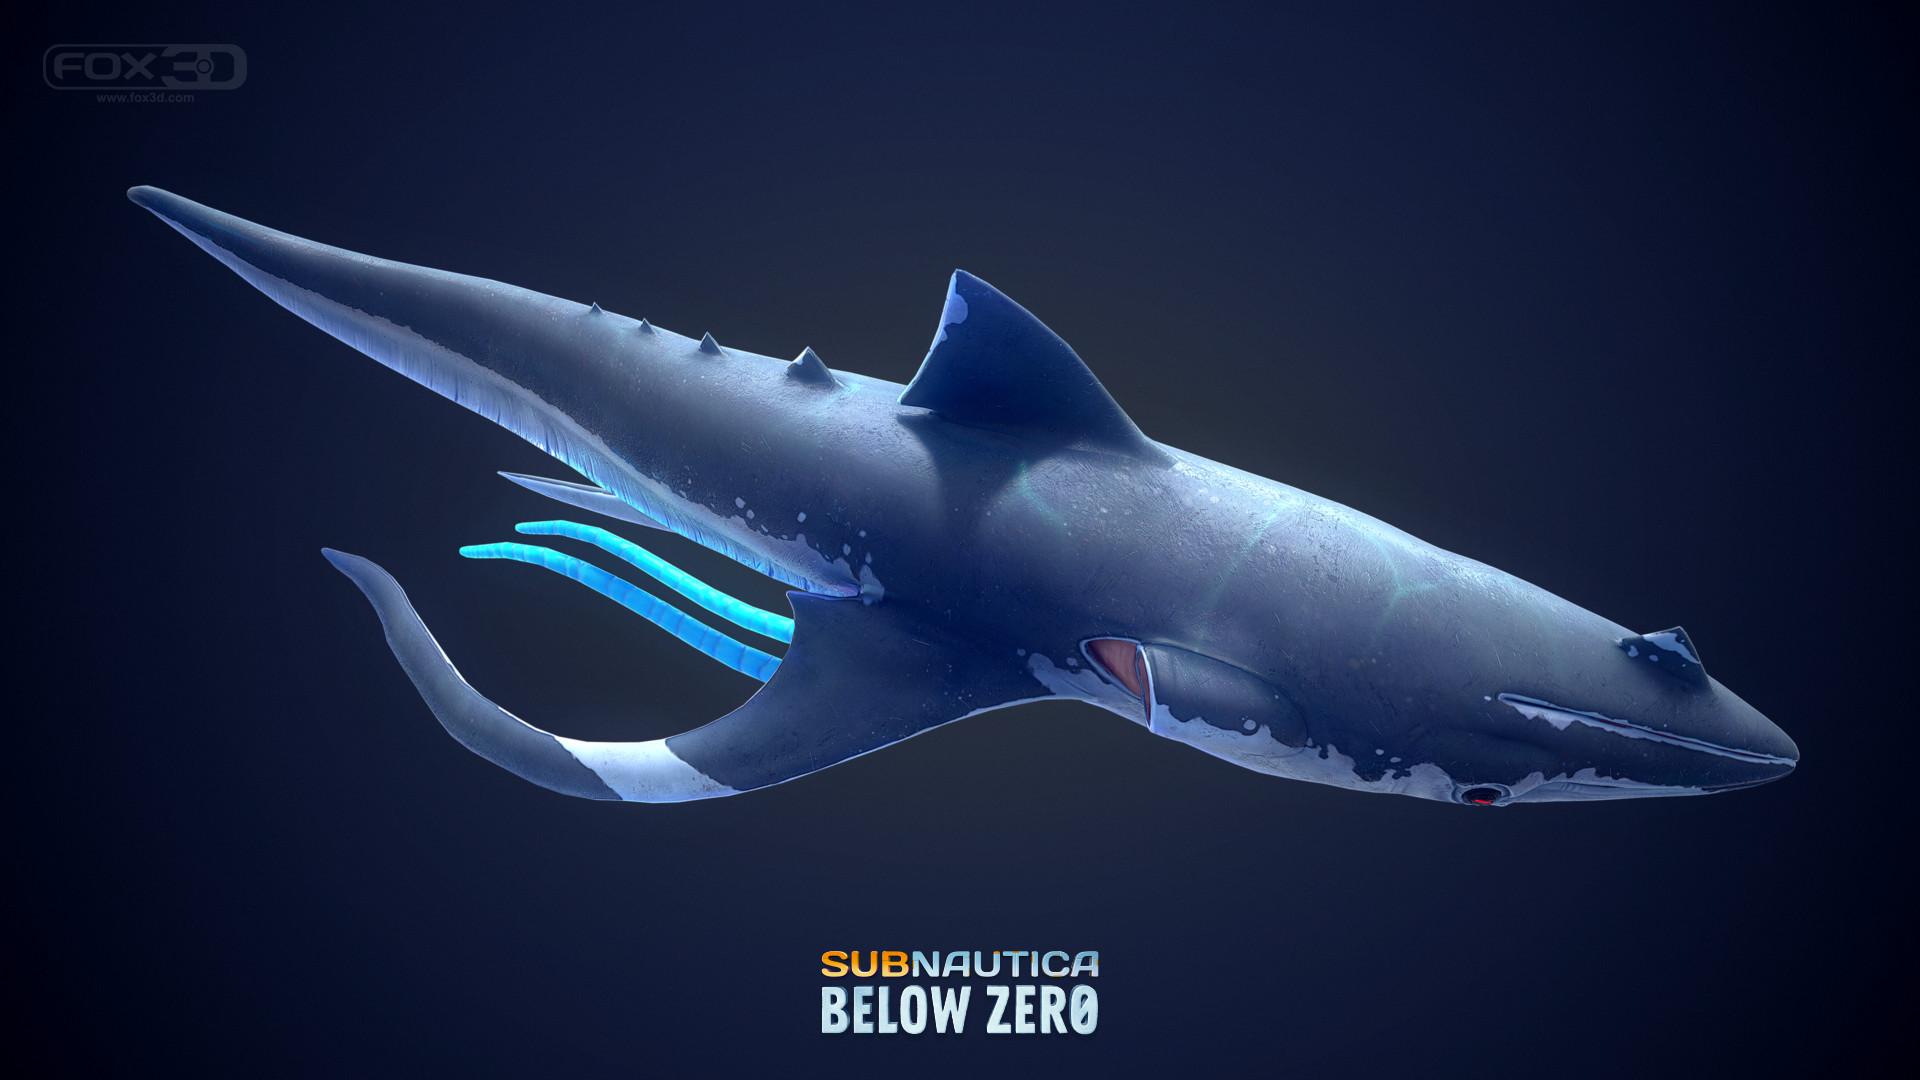 FOX3D ENTERTAINMENT - Subnautica: Below Zero